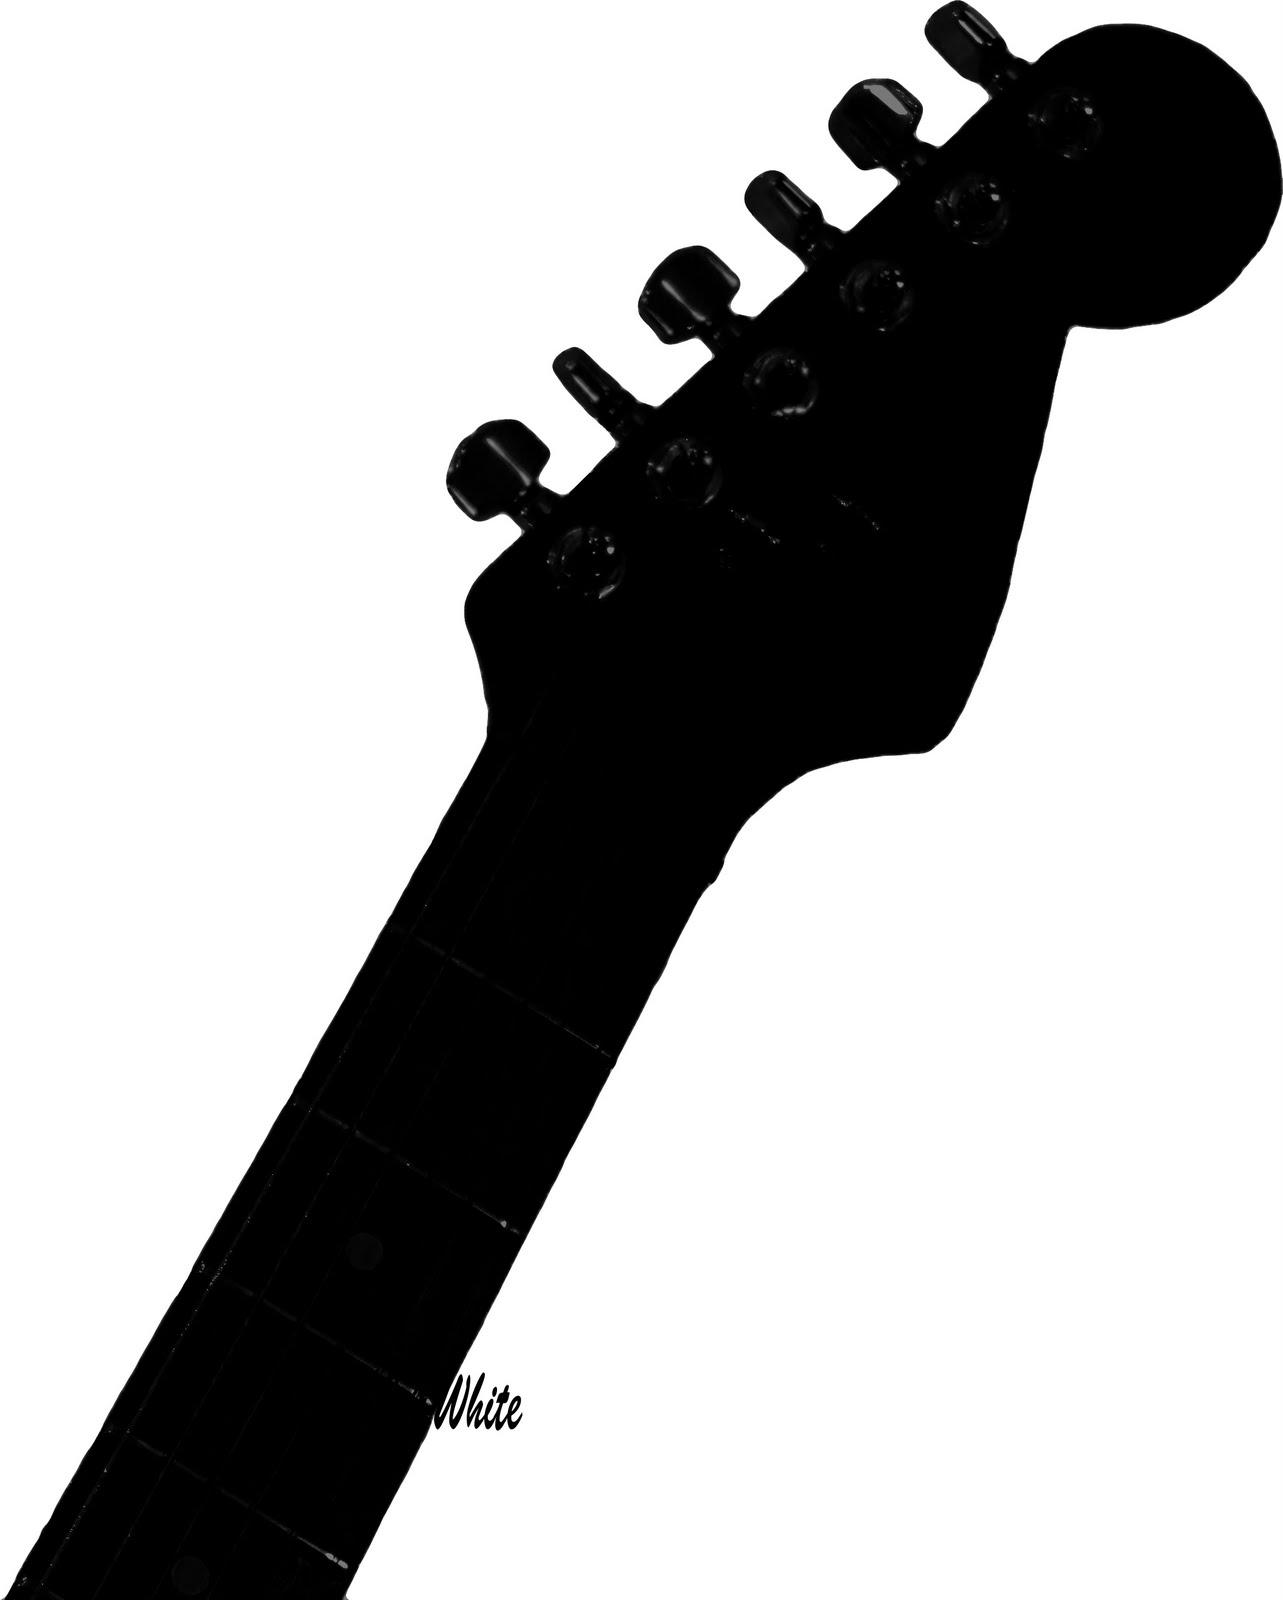 Guitar Silhouette Clipart - Clipart Suggest